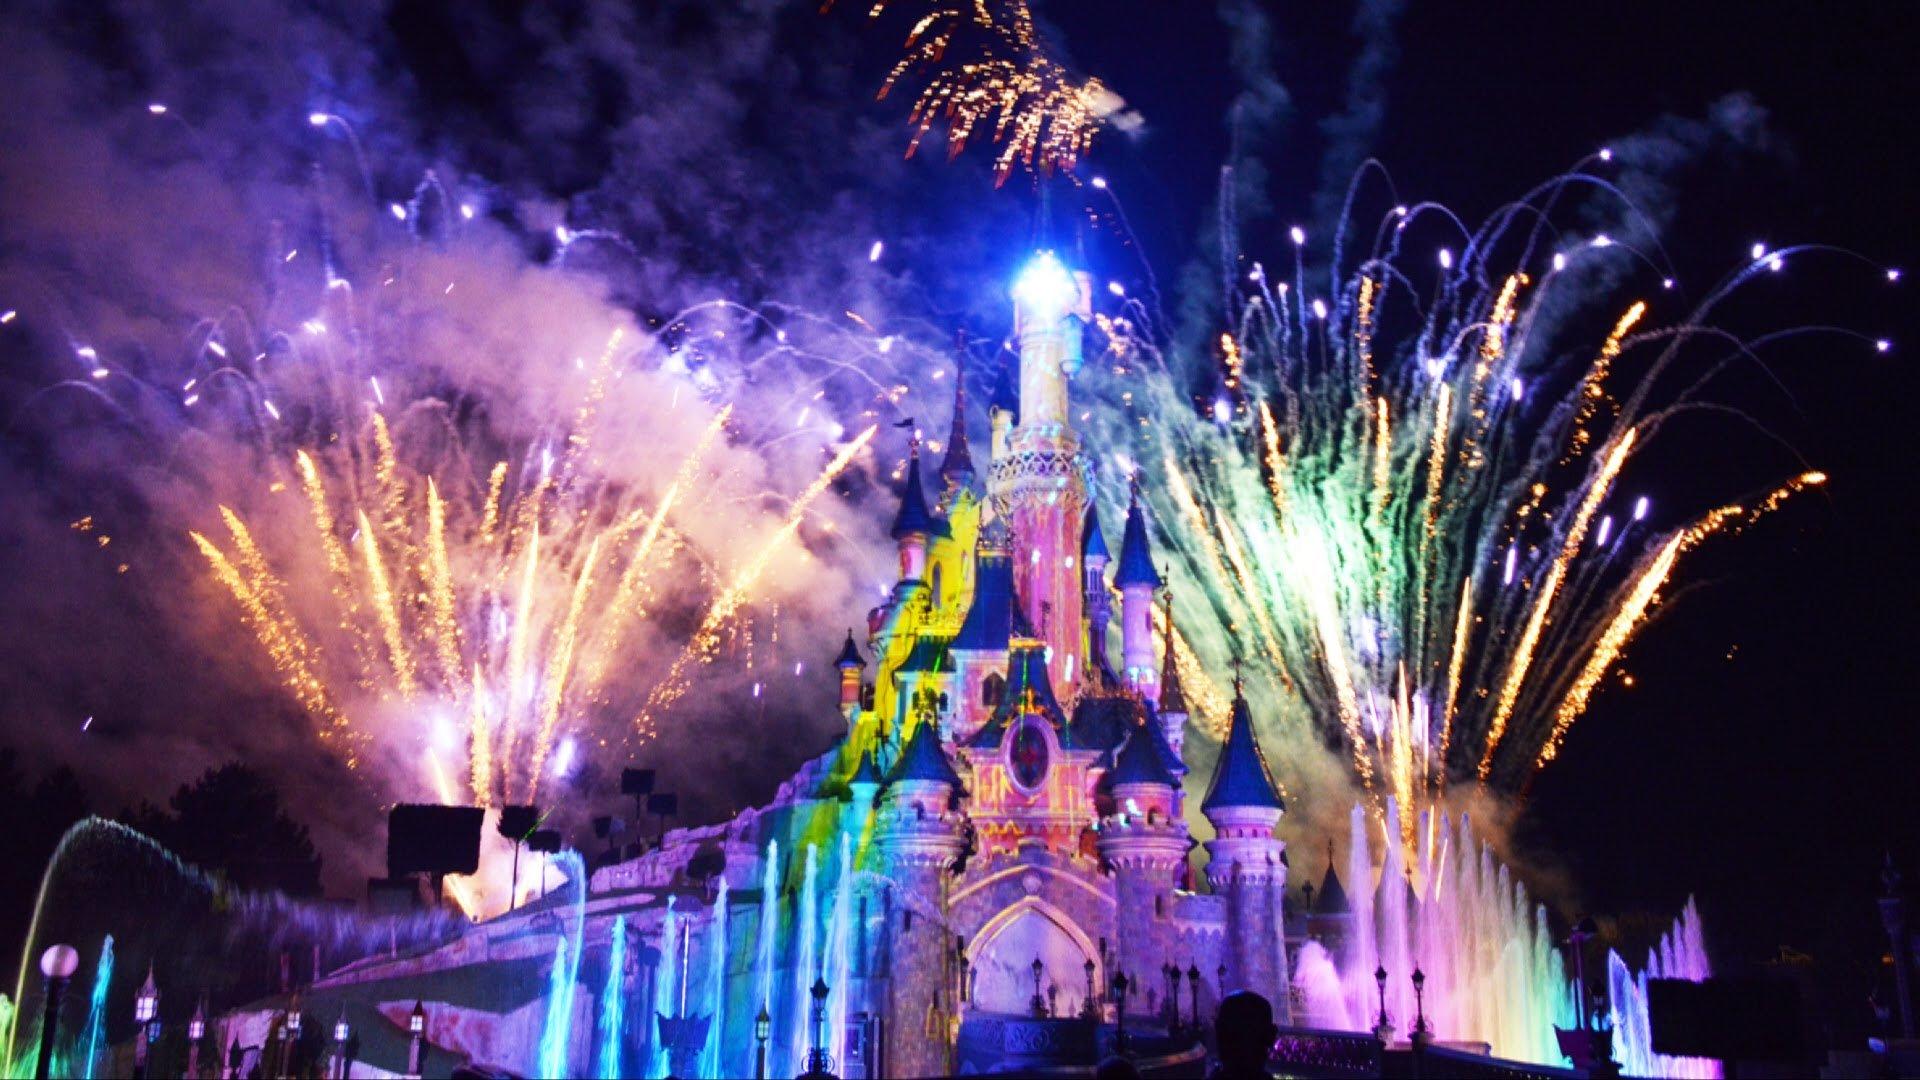 maxresdefault 1.jpg?resize=1200,630 - Disneyland lance son festival Electro: rendez-vous le 8 juillet prochain !